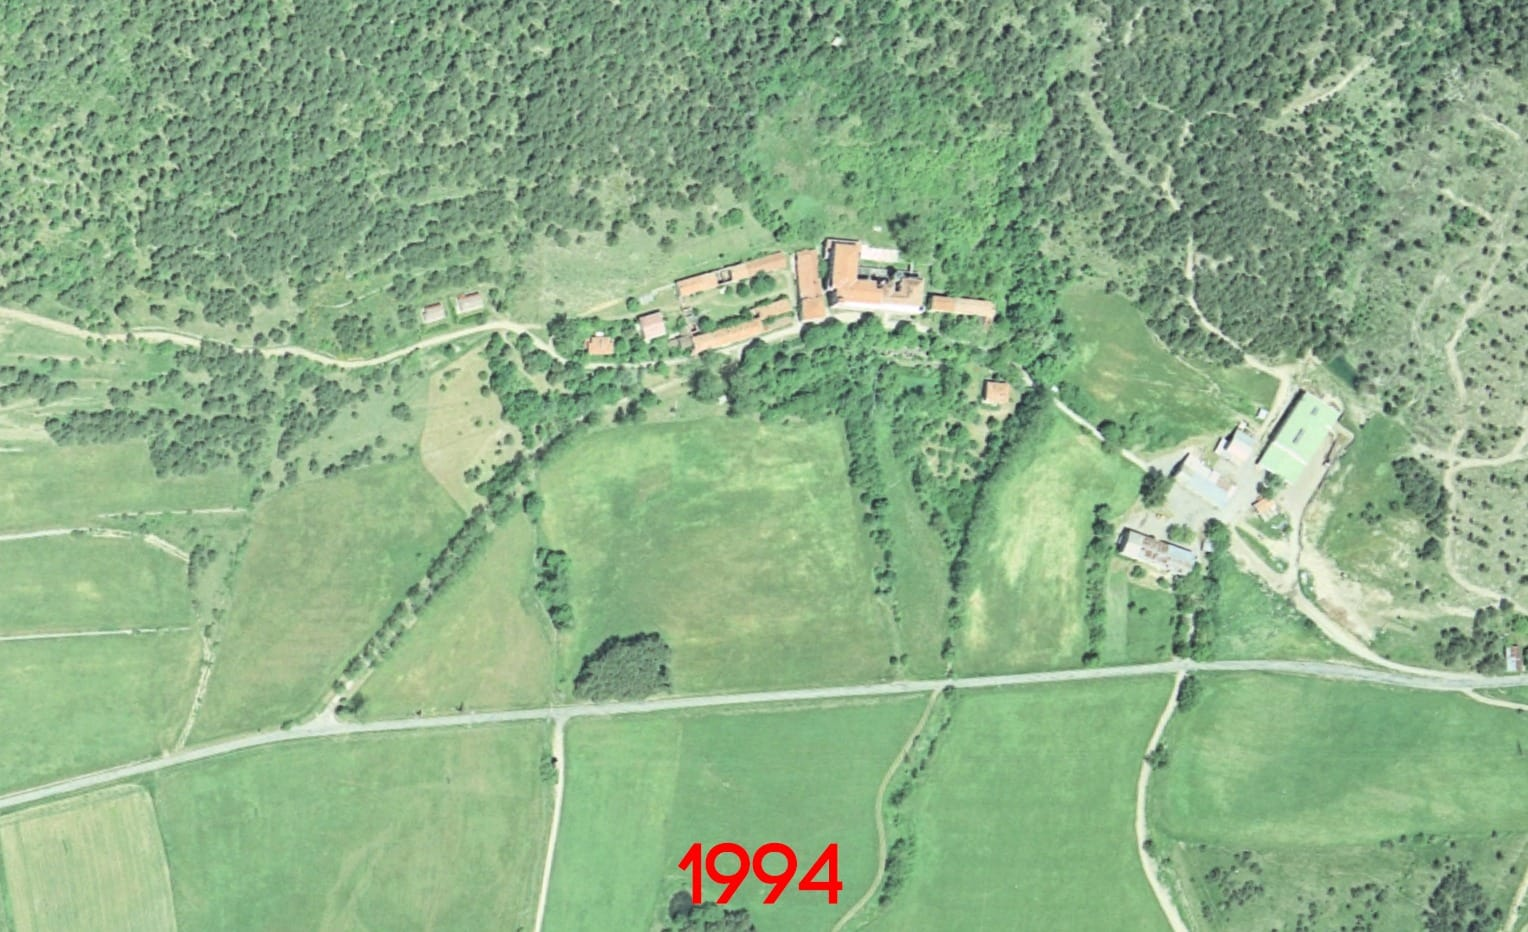 hopital-felix-zehetner-before-map-1994